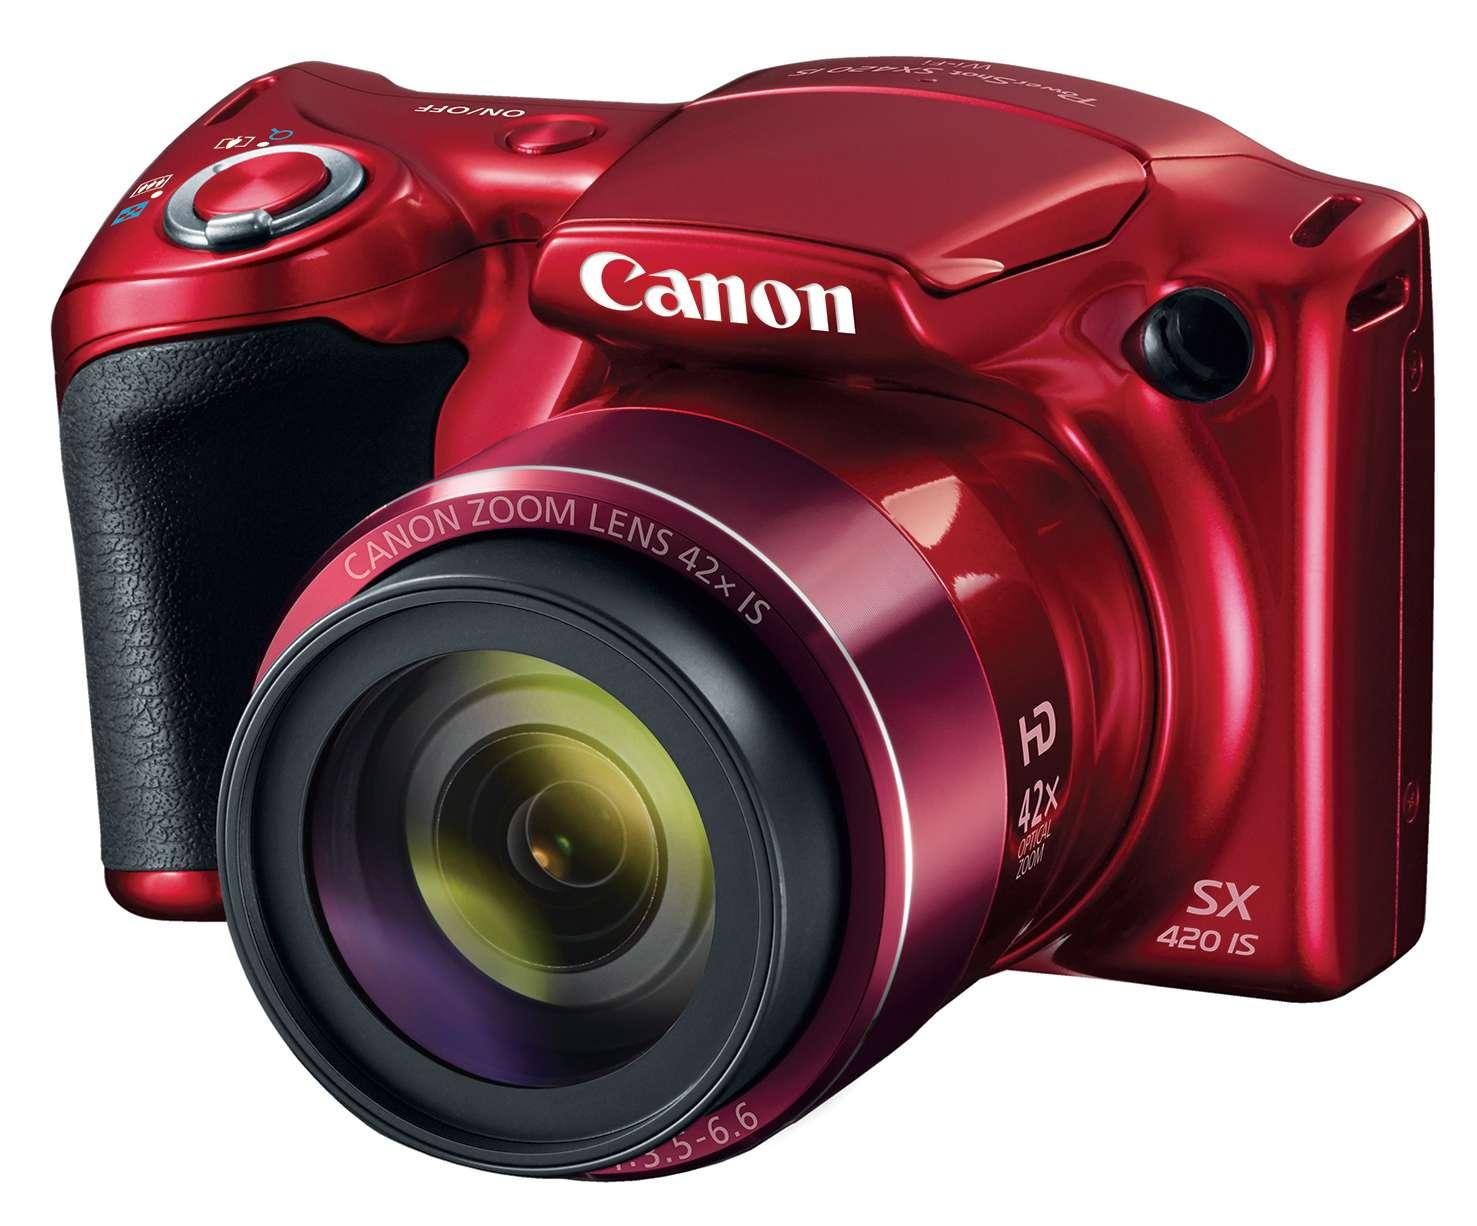 Canon PowerShot SX420 camera.